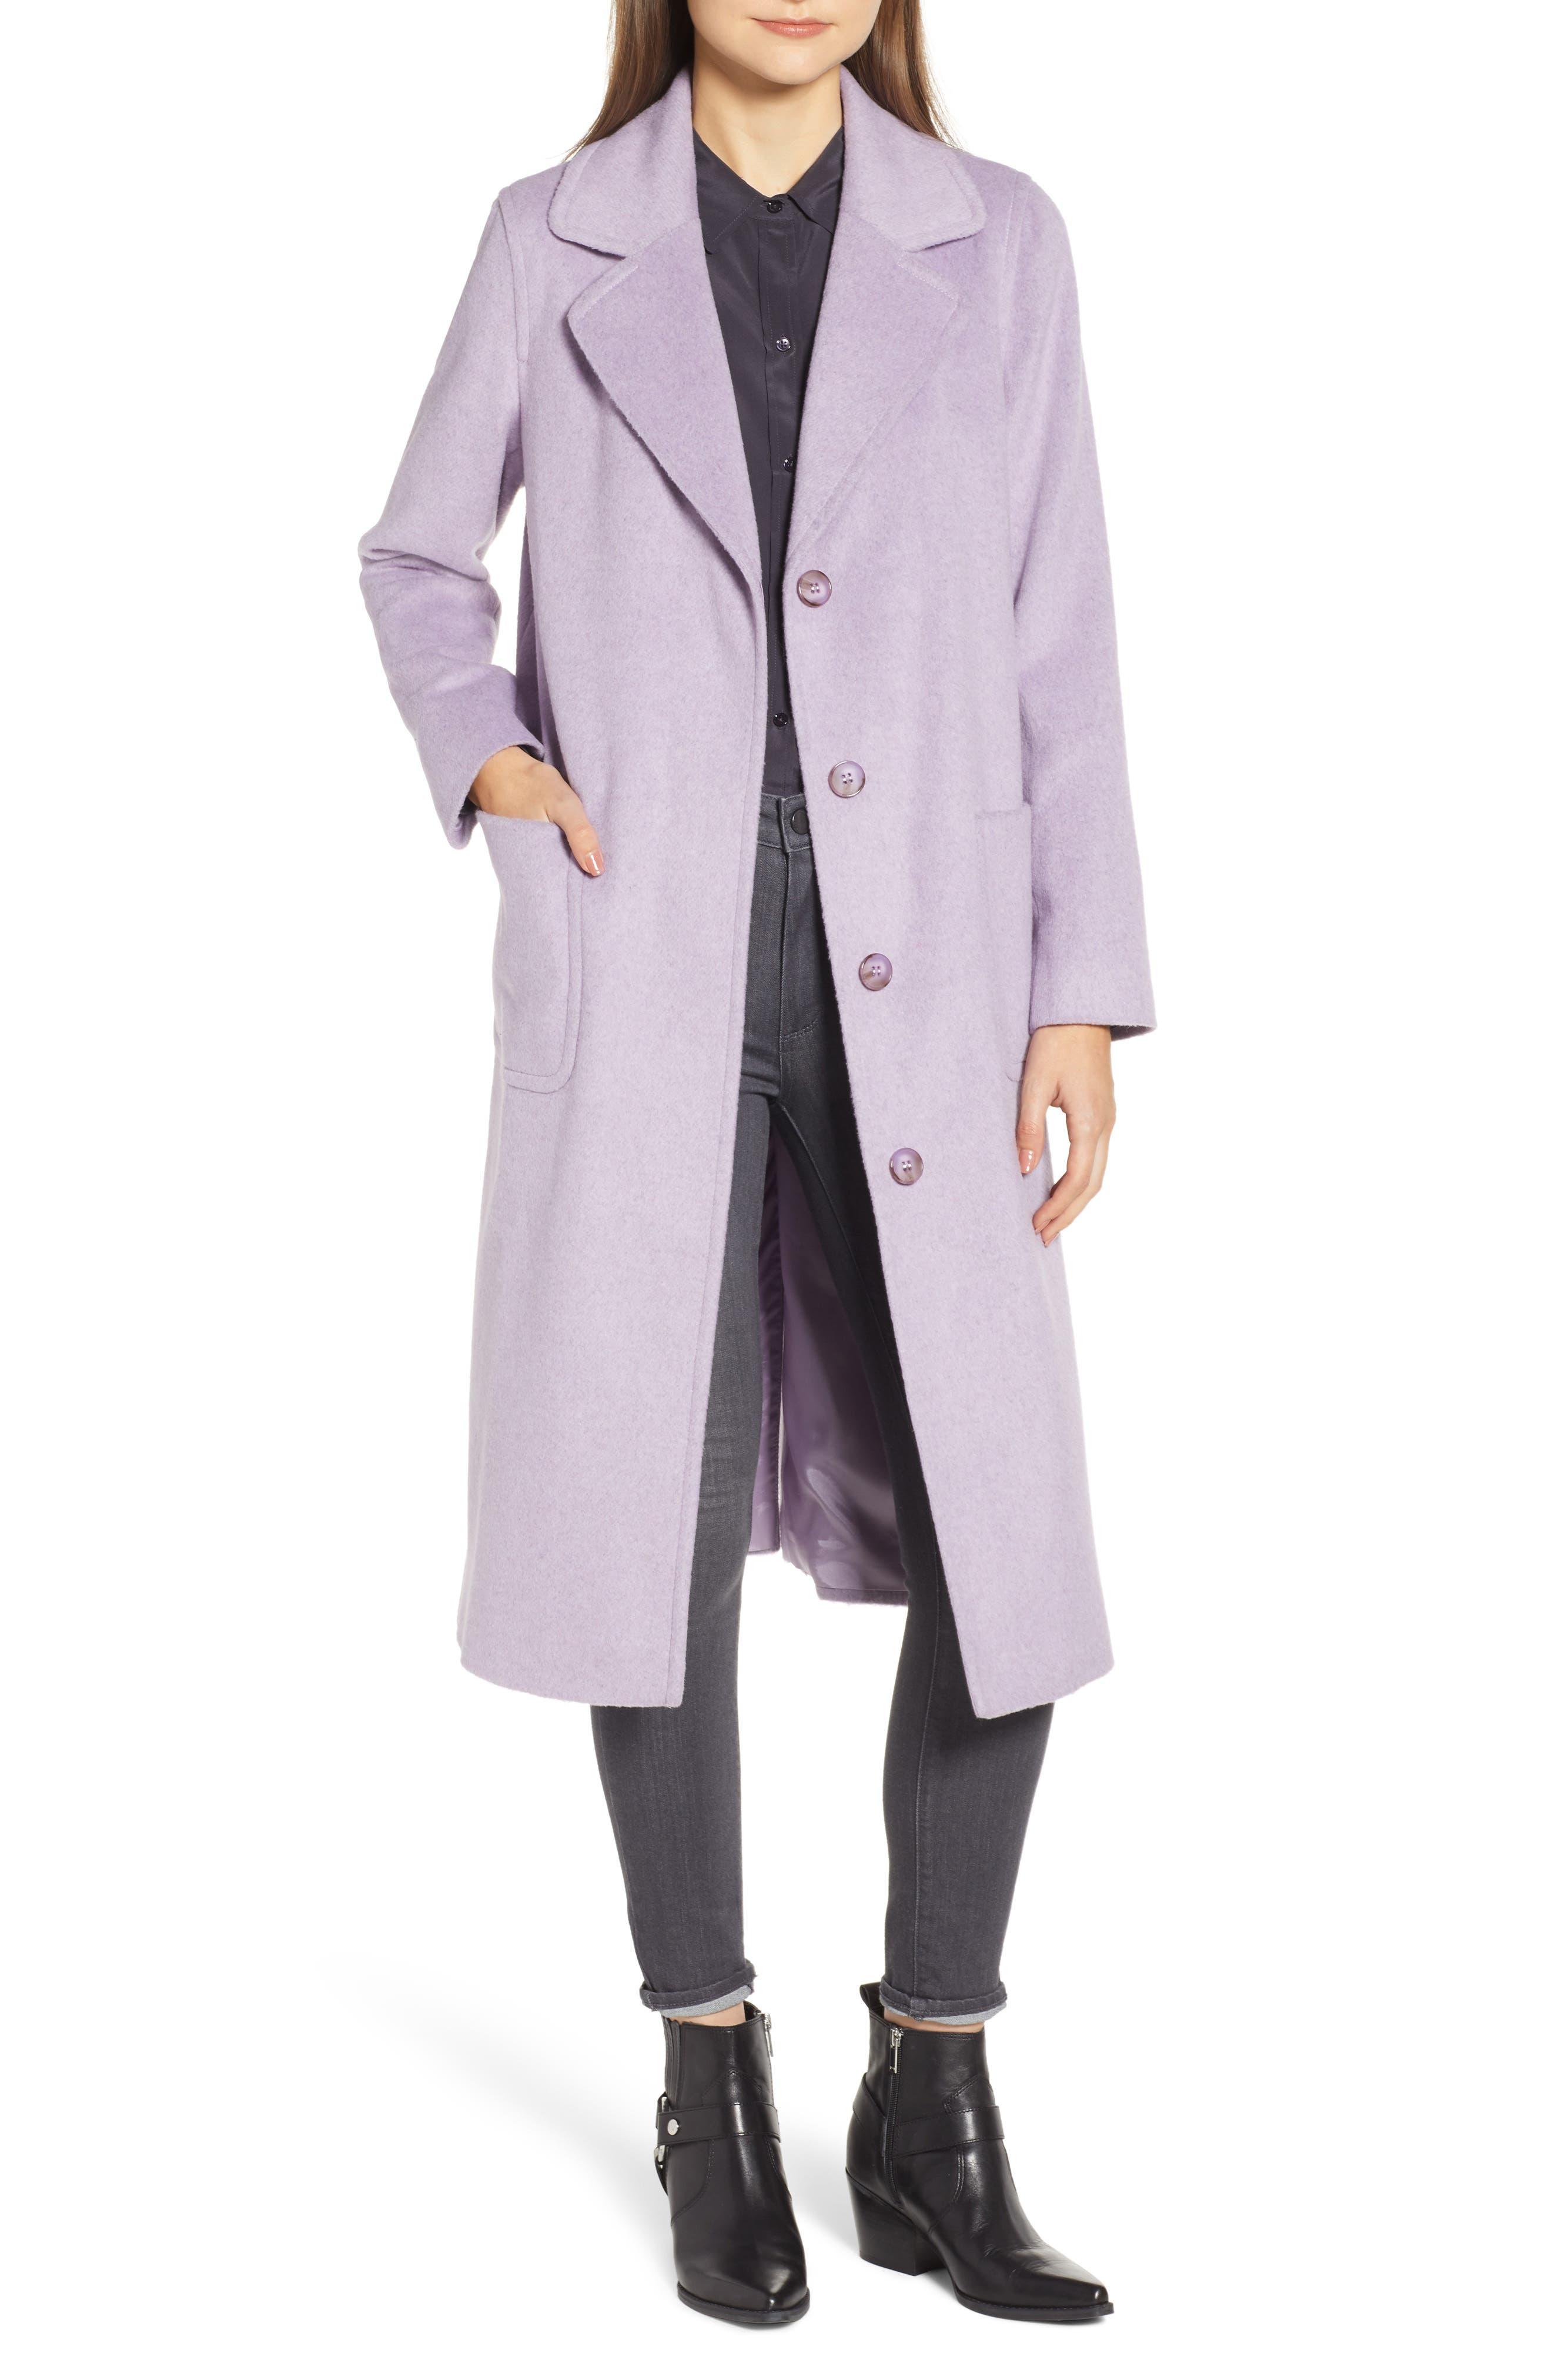 Ruth Knee Length Coat,                             Main thumbnail 1, color,                             500